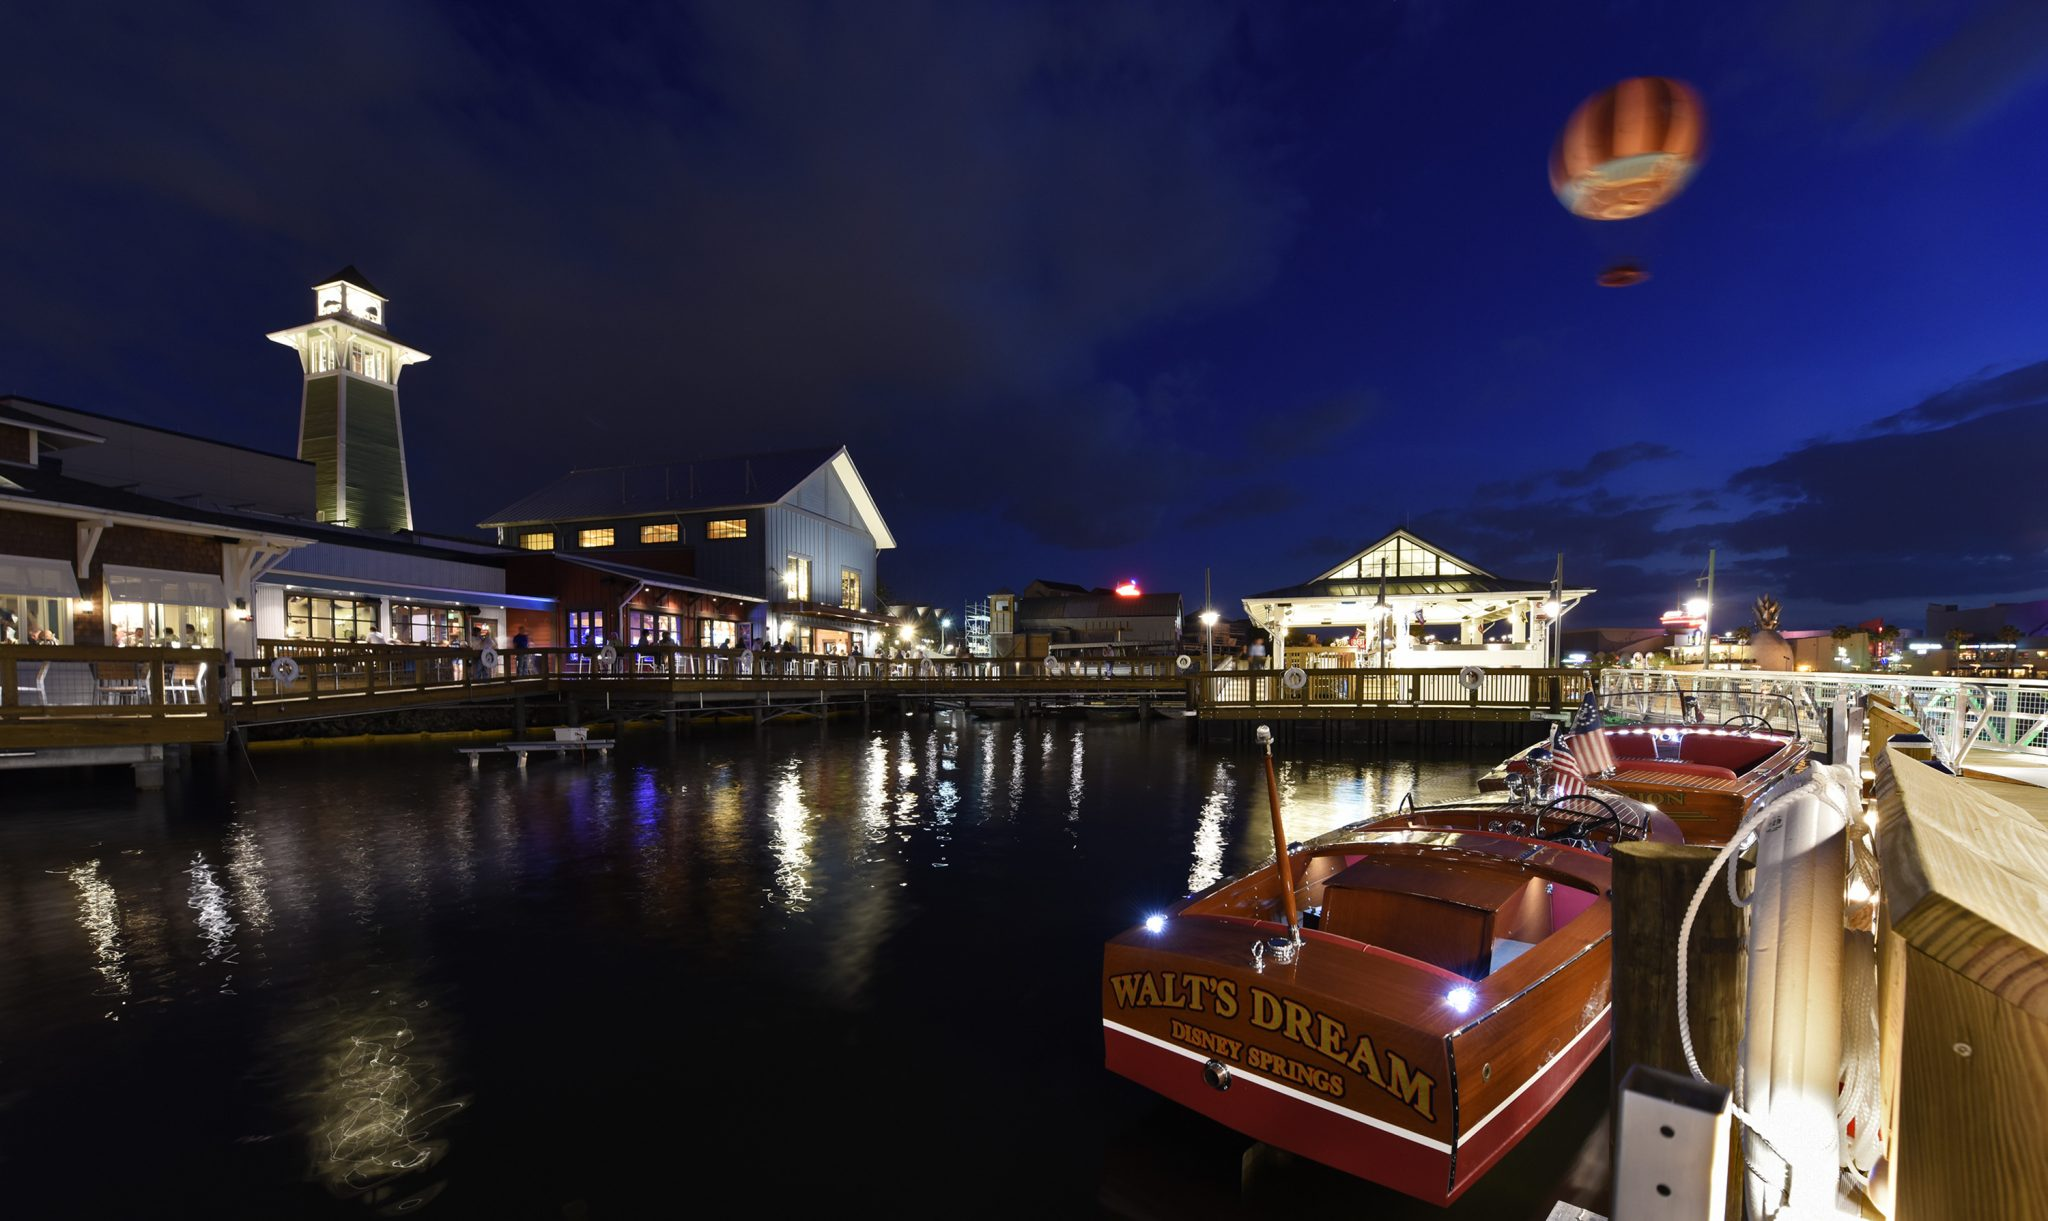 ResortLoop.com Episode 253 – Downtown Disney No More